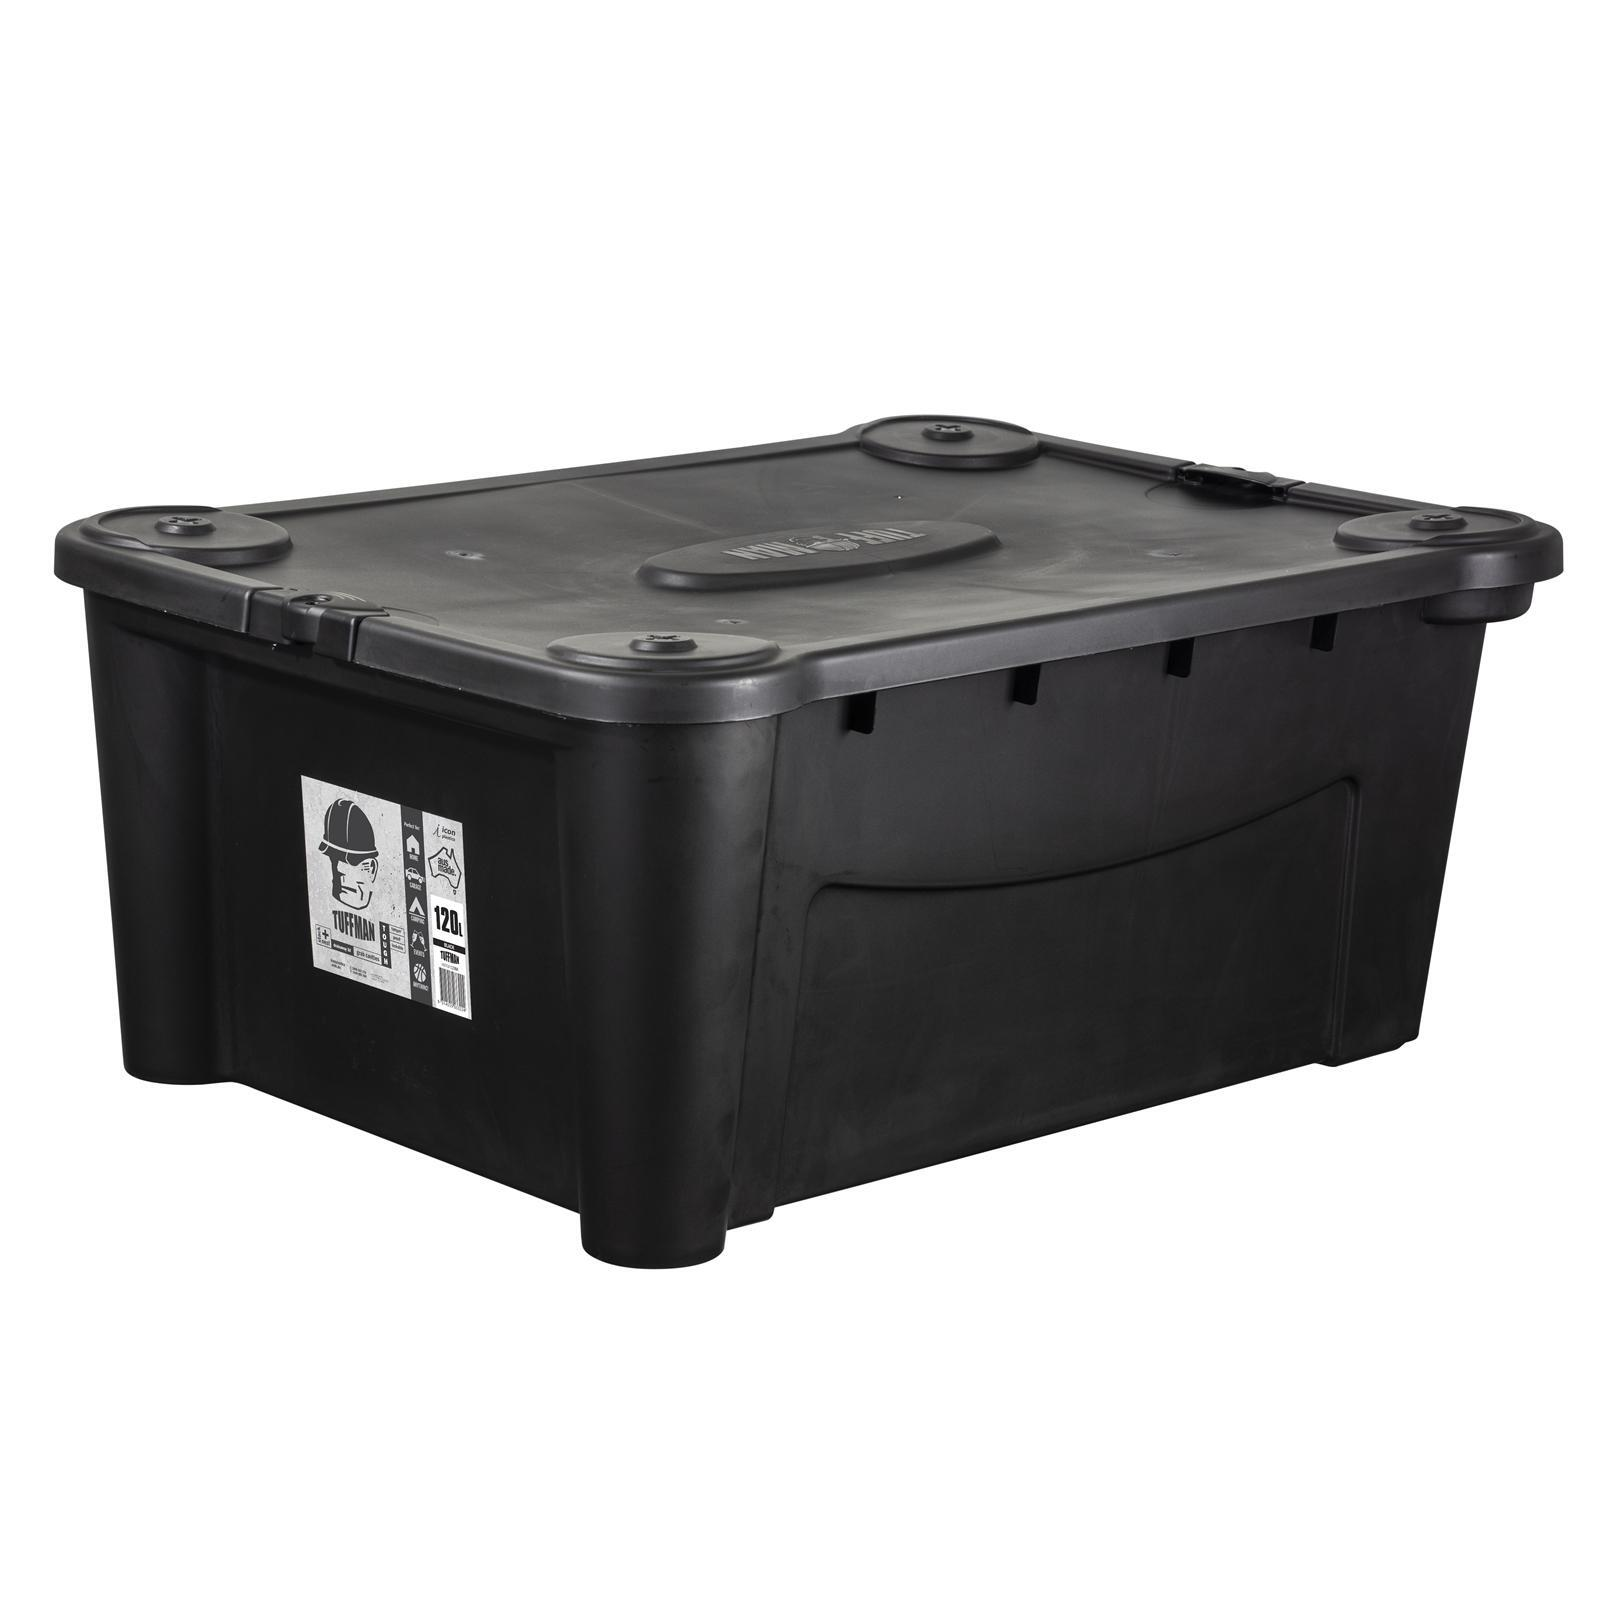 Icon Plastics 120L Black Tuffman Heavy Duty Storage Container